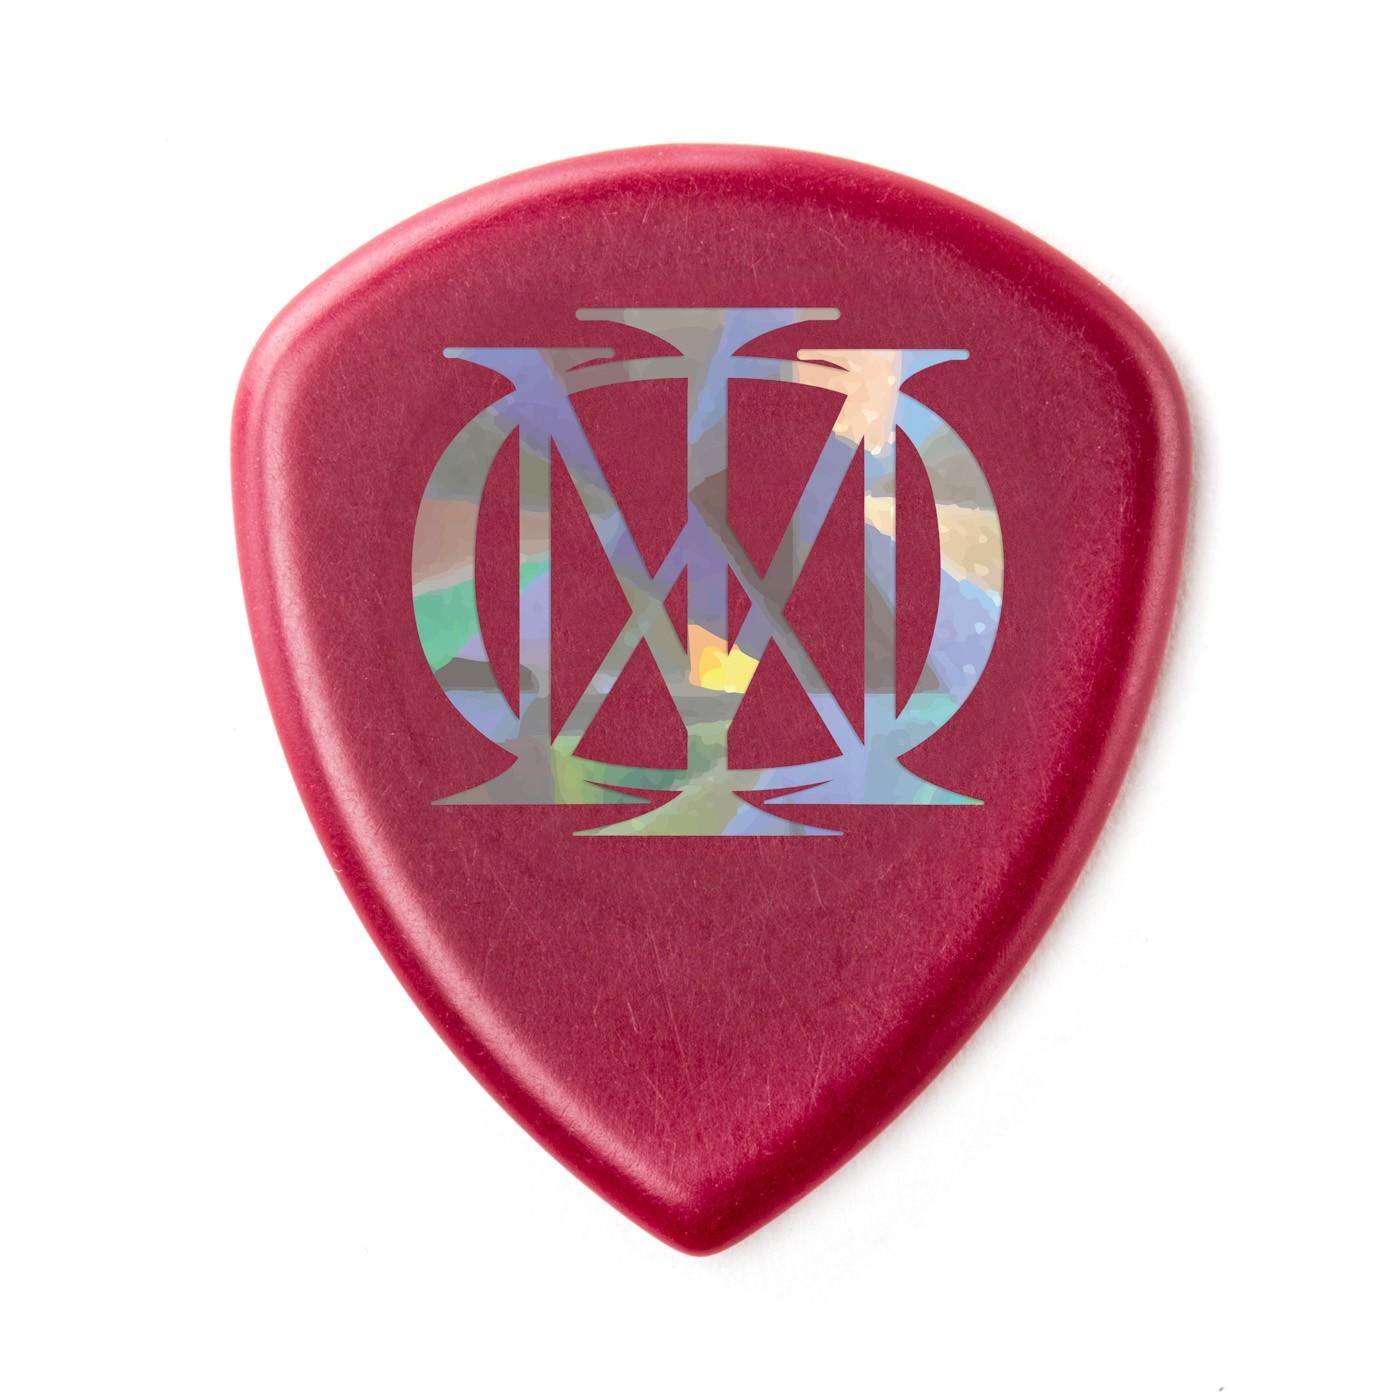 DUNLOP Médiators John Petrucci Flow